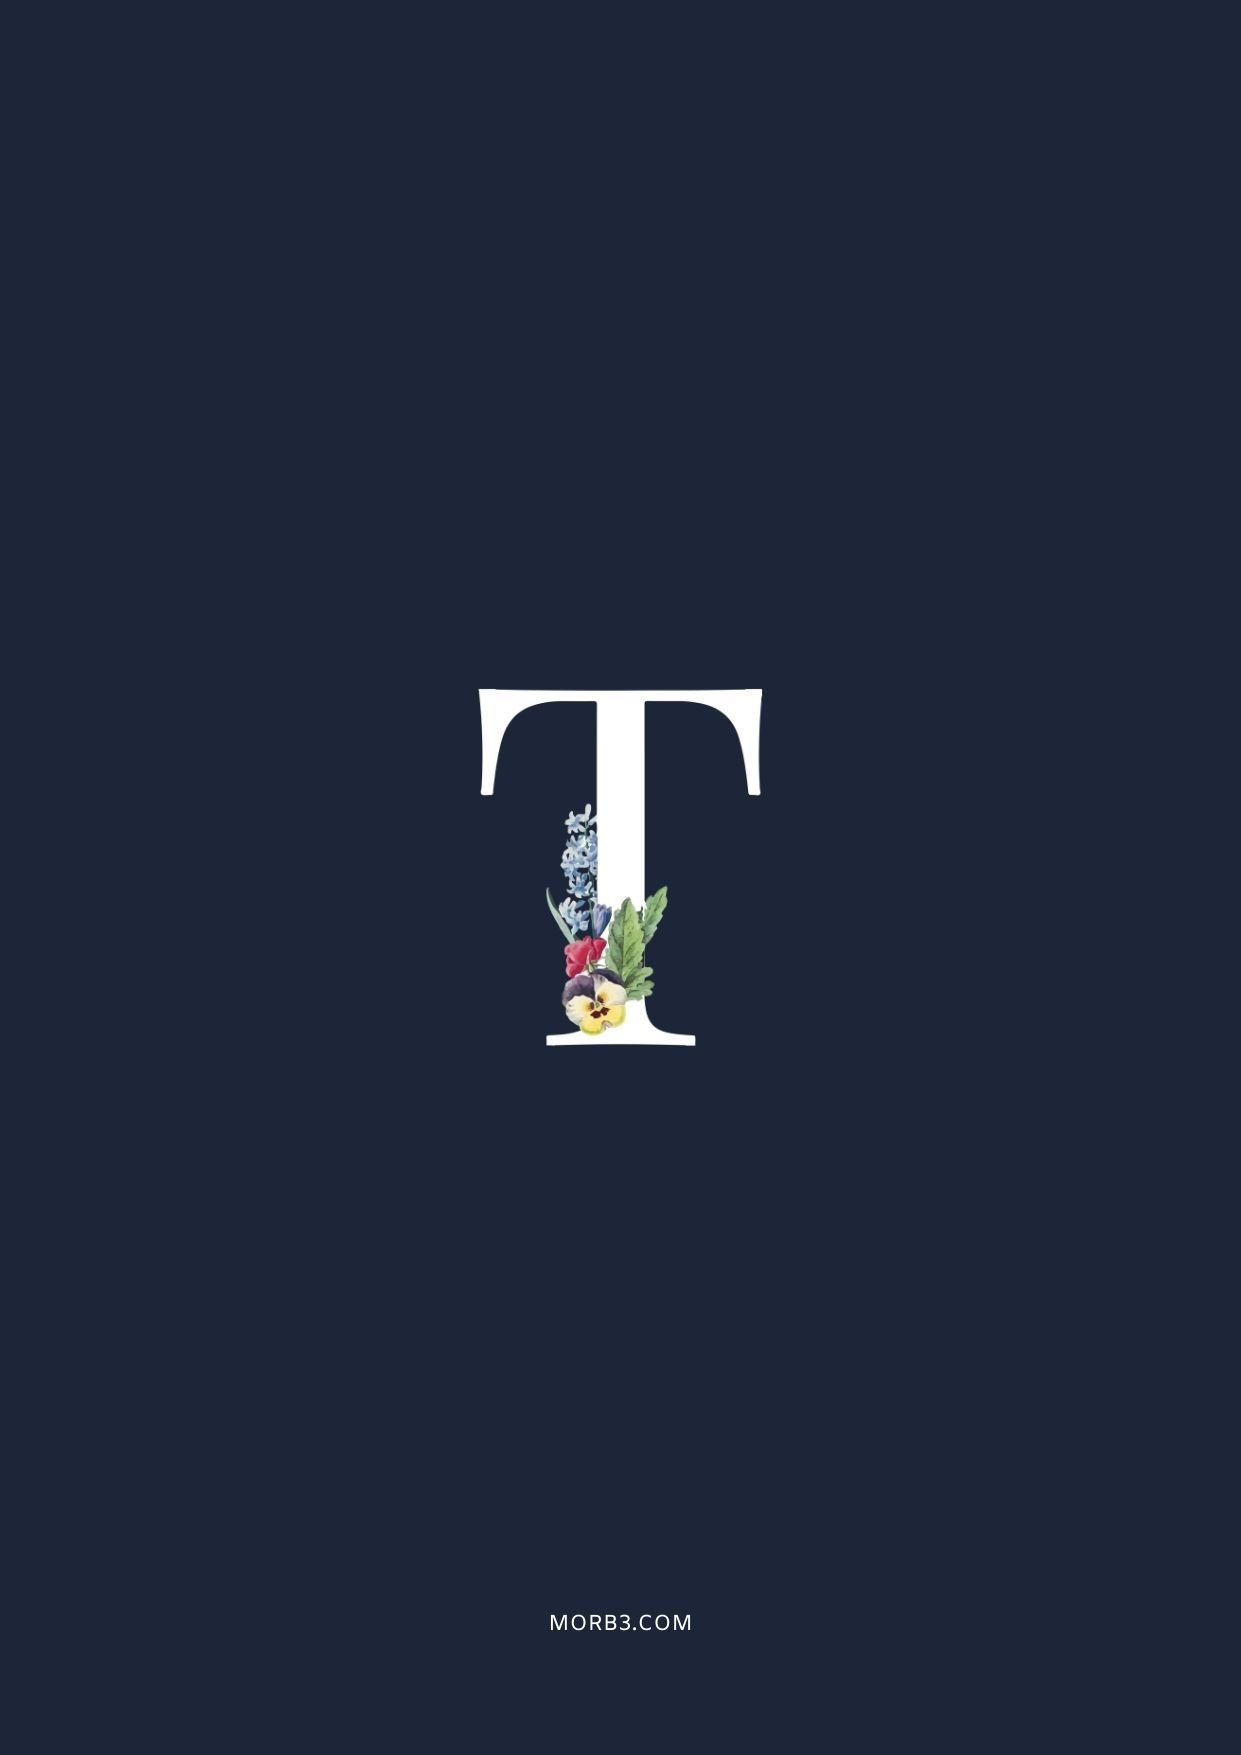 صور حرف T خلفيات حرف T خلفيات حرف T رومانسية اجمل حرف T في العالم حرف T بالورد حرف T احبك حرف T في قلوب حرف T مع كلام حب خلفيات حرف